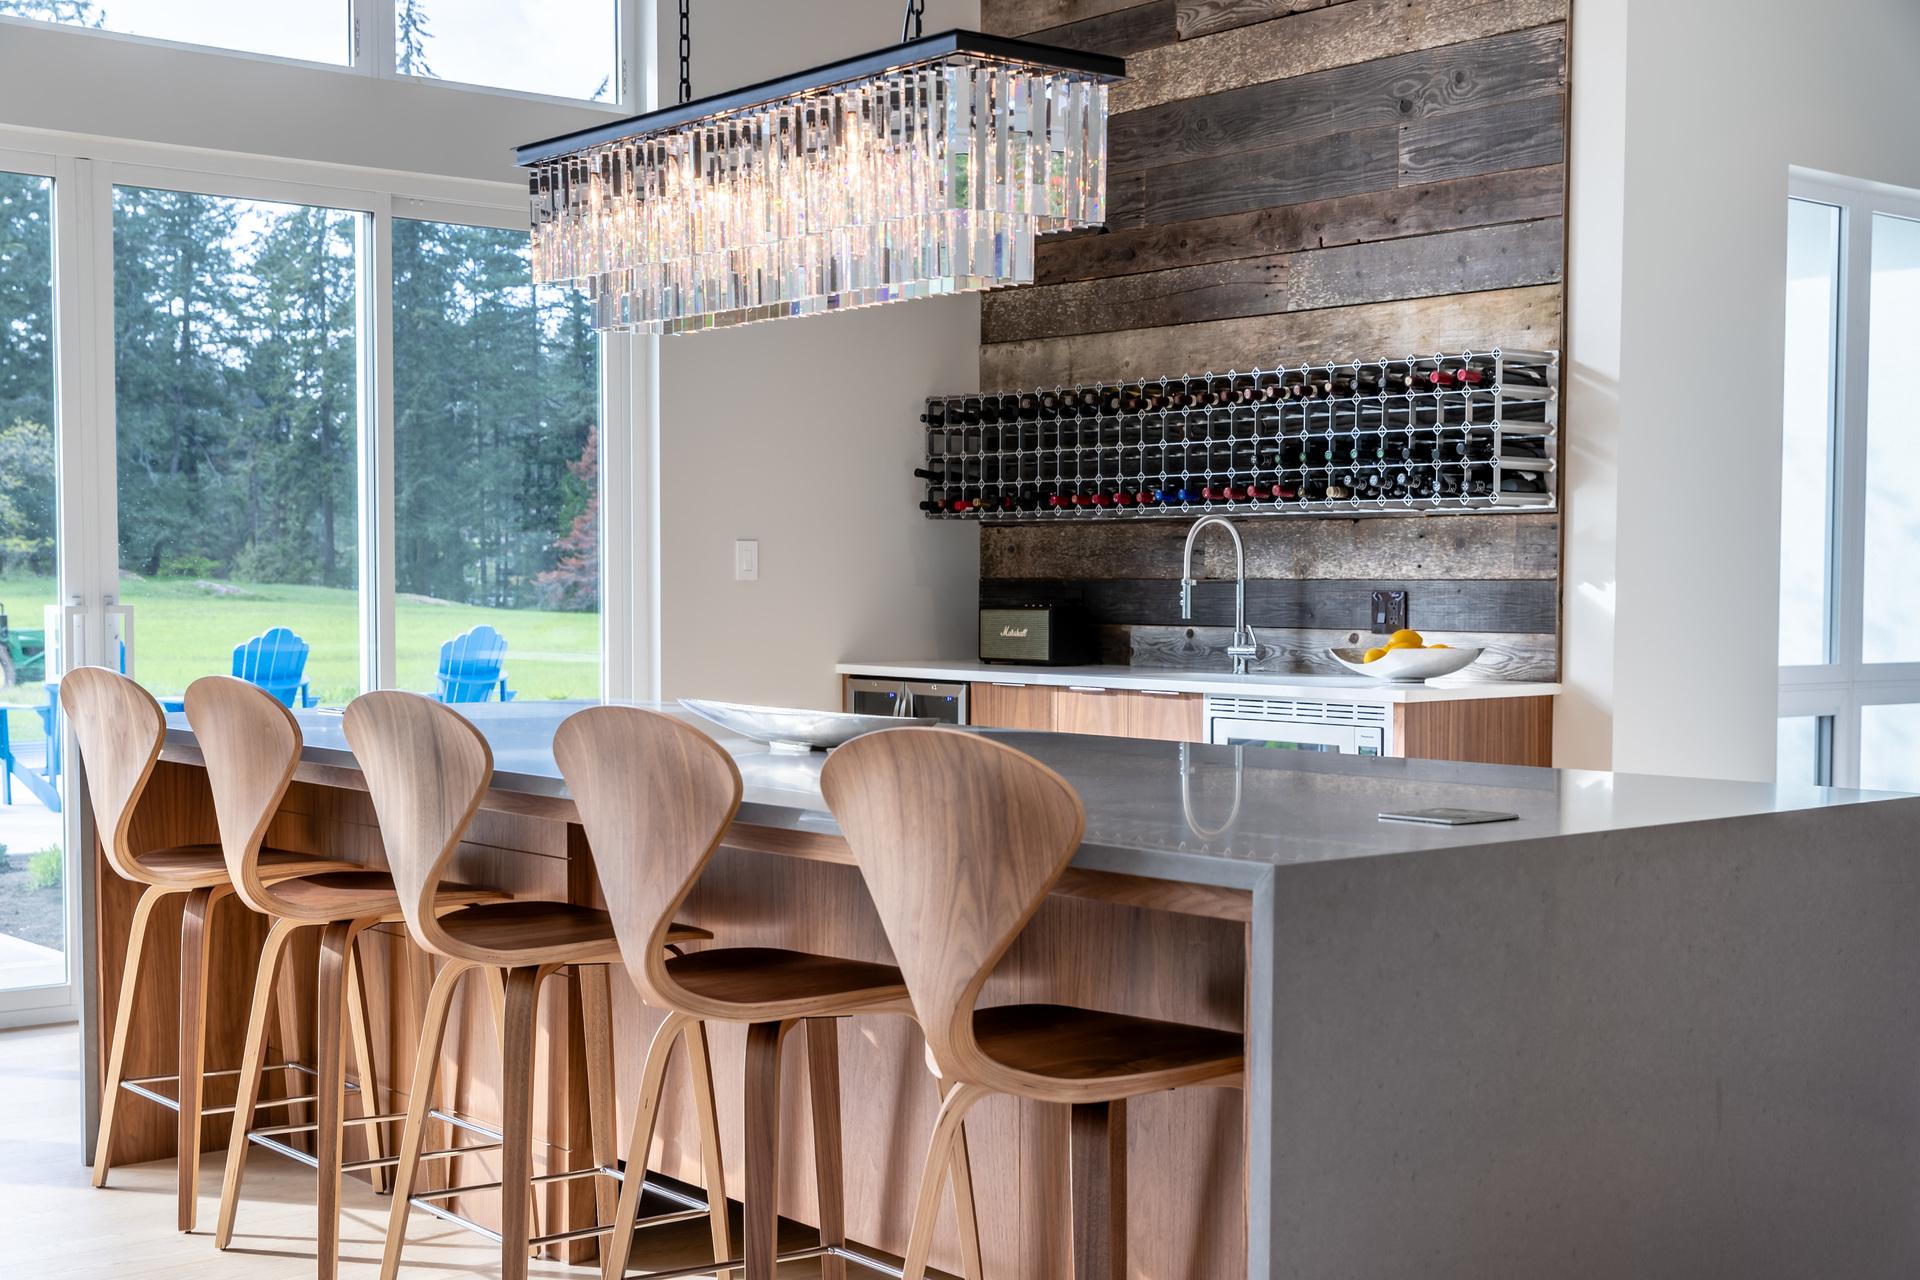 Breakfast Bar/Island & Wet Bar With Wine Storage at 5101 Jagtar's Way, Prospect Lake, Saanich West